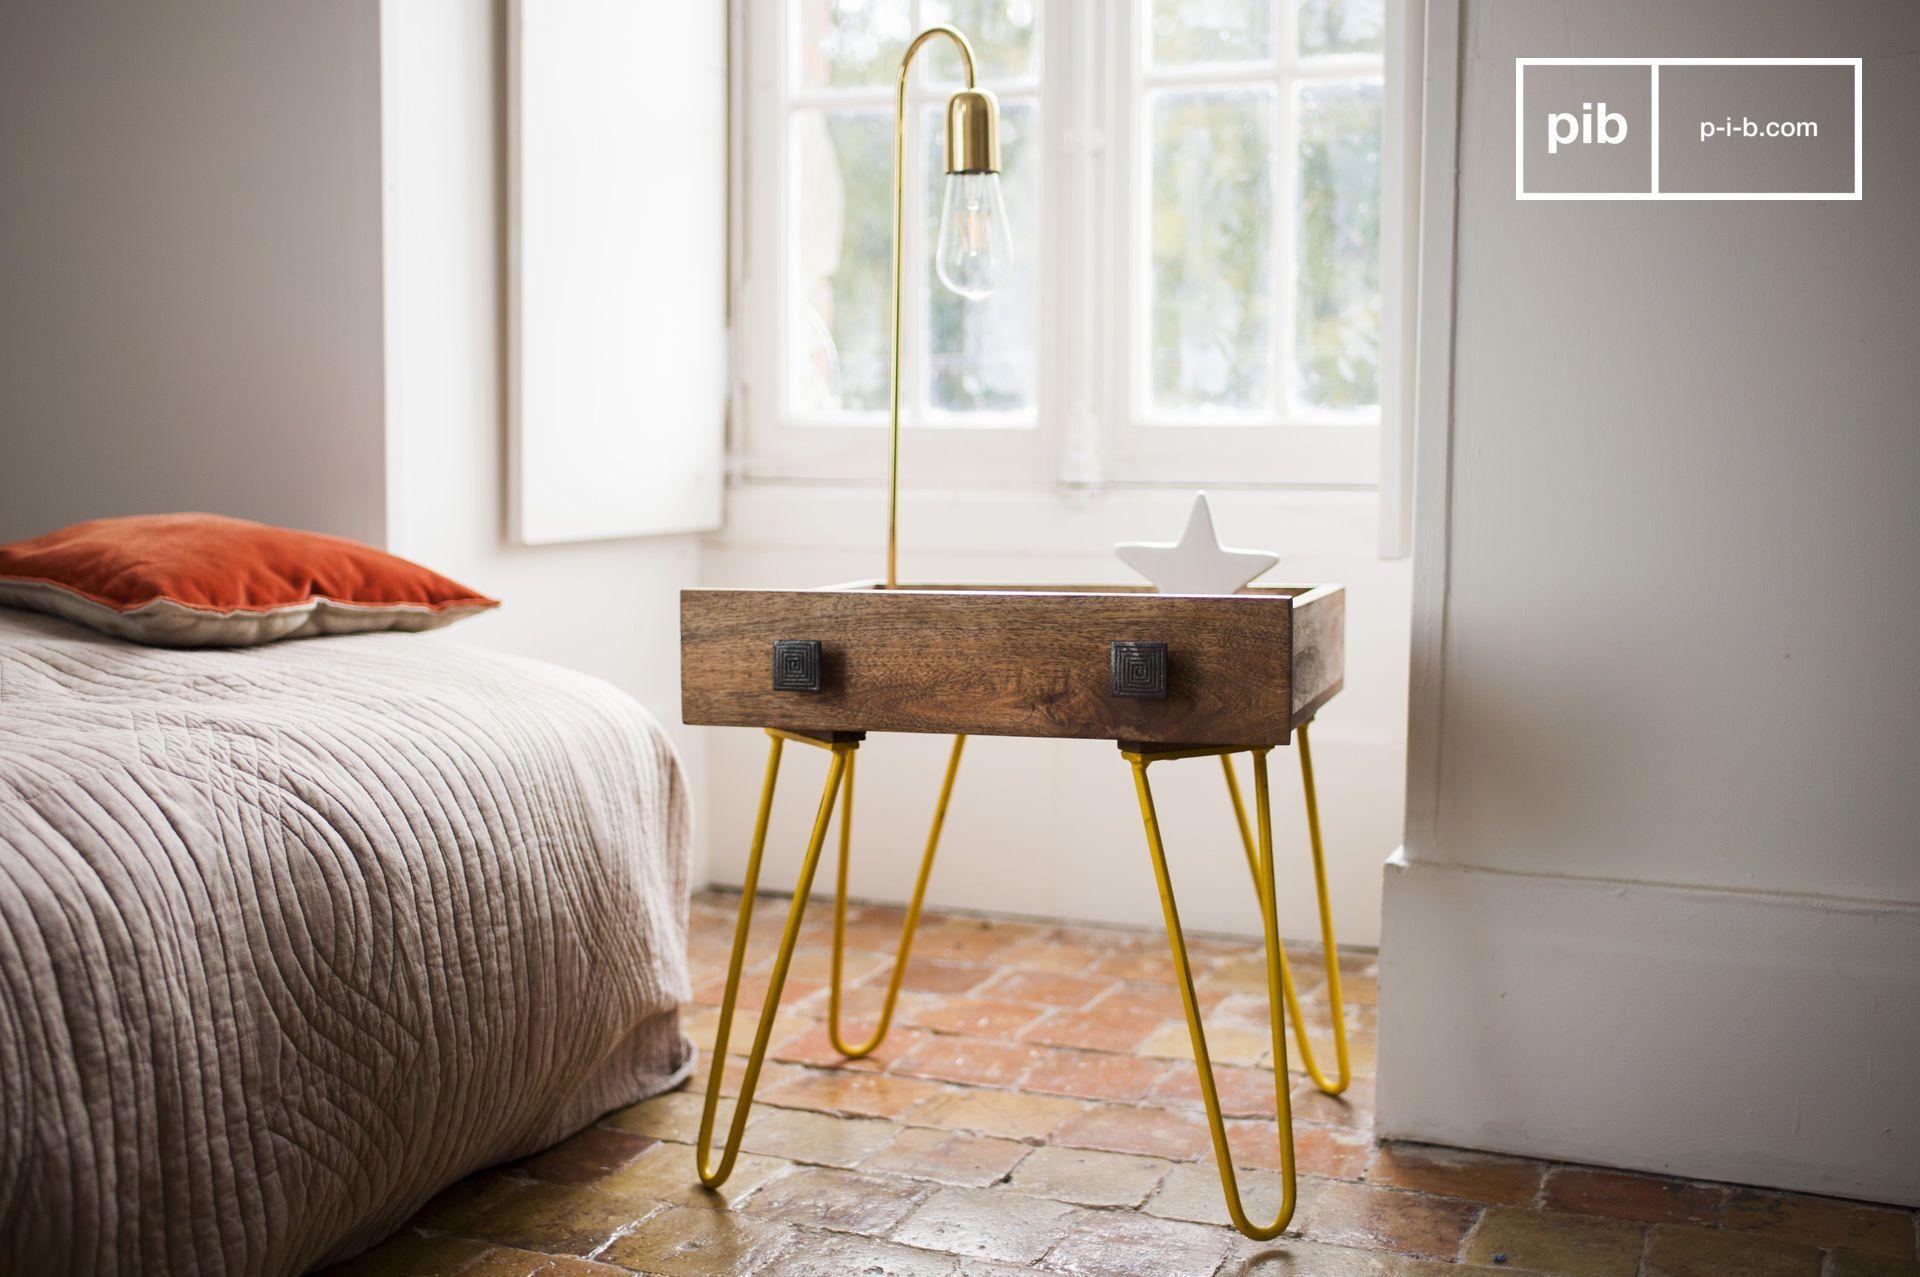 Table d'appoint industrielle en bois marron